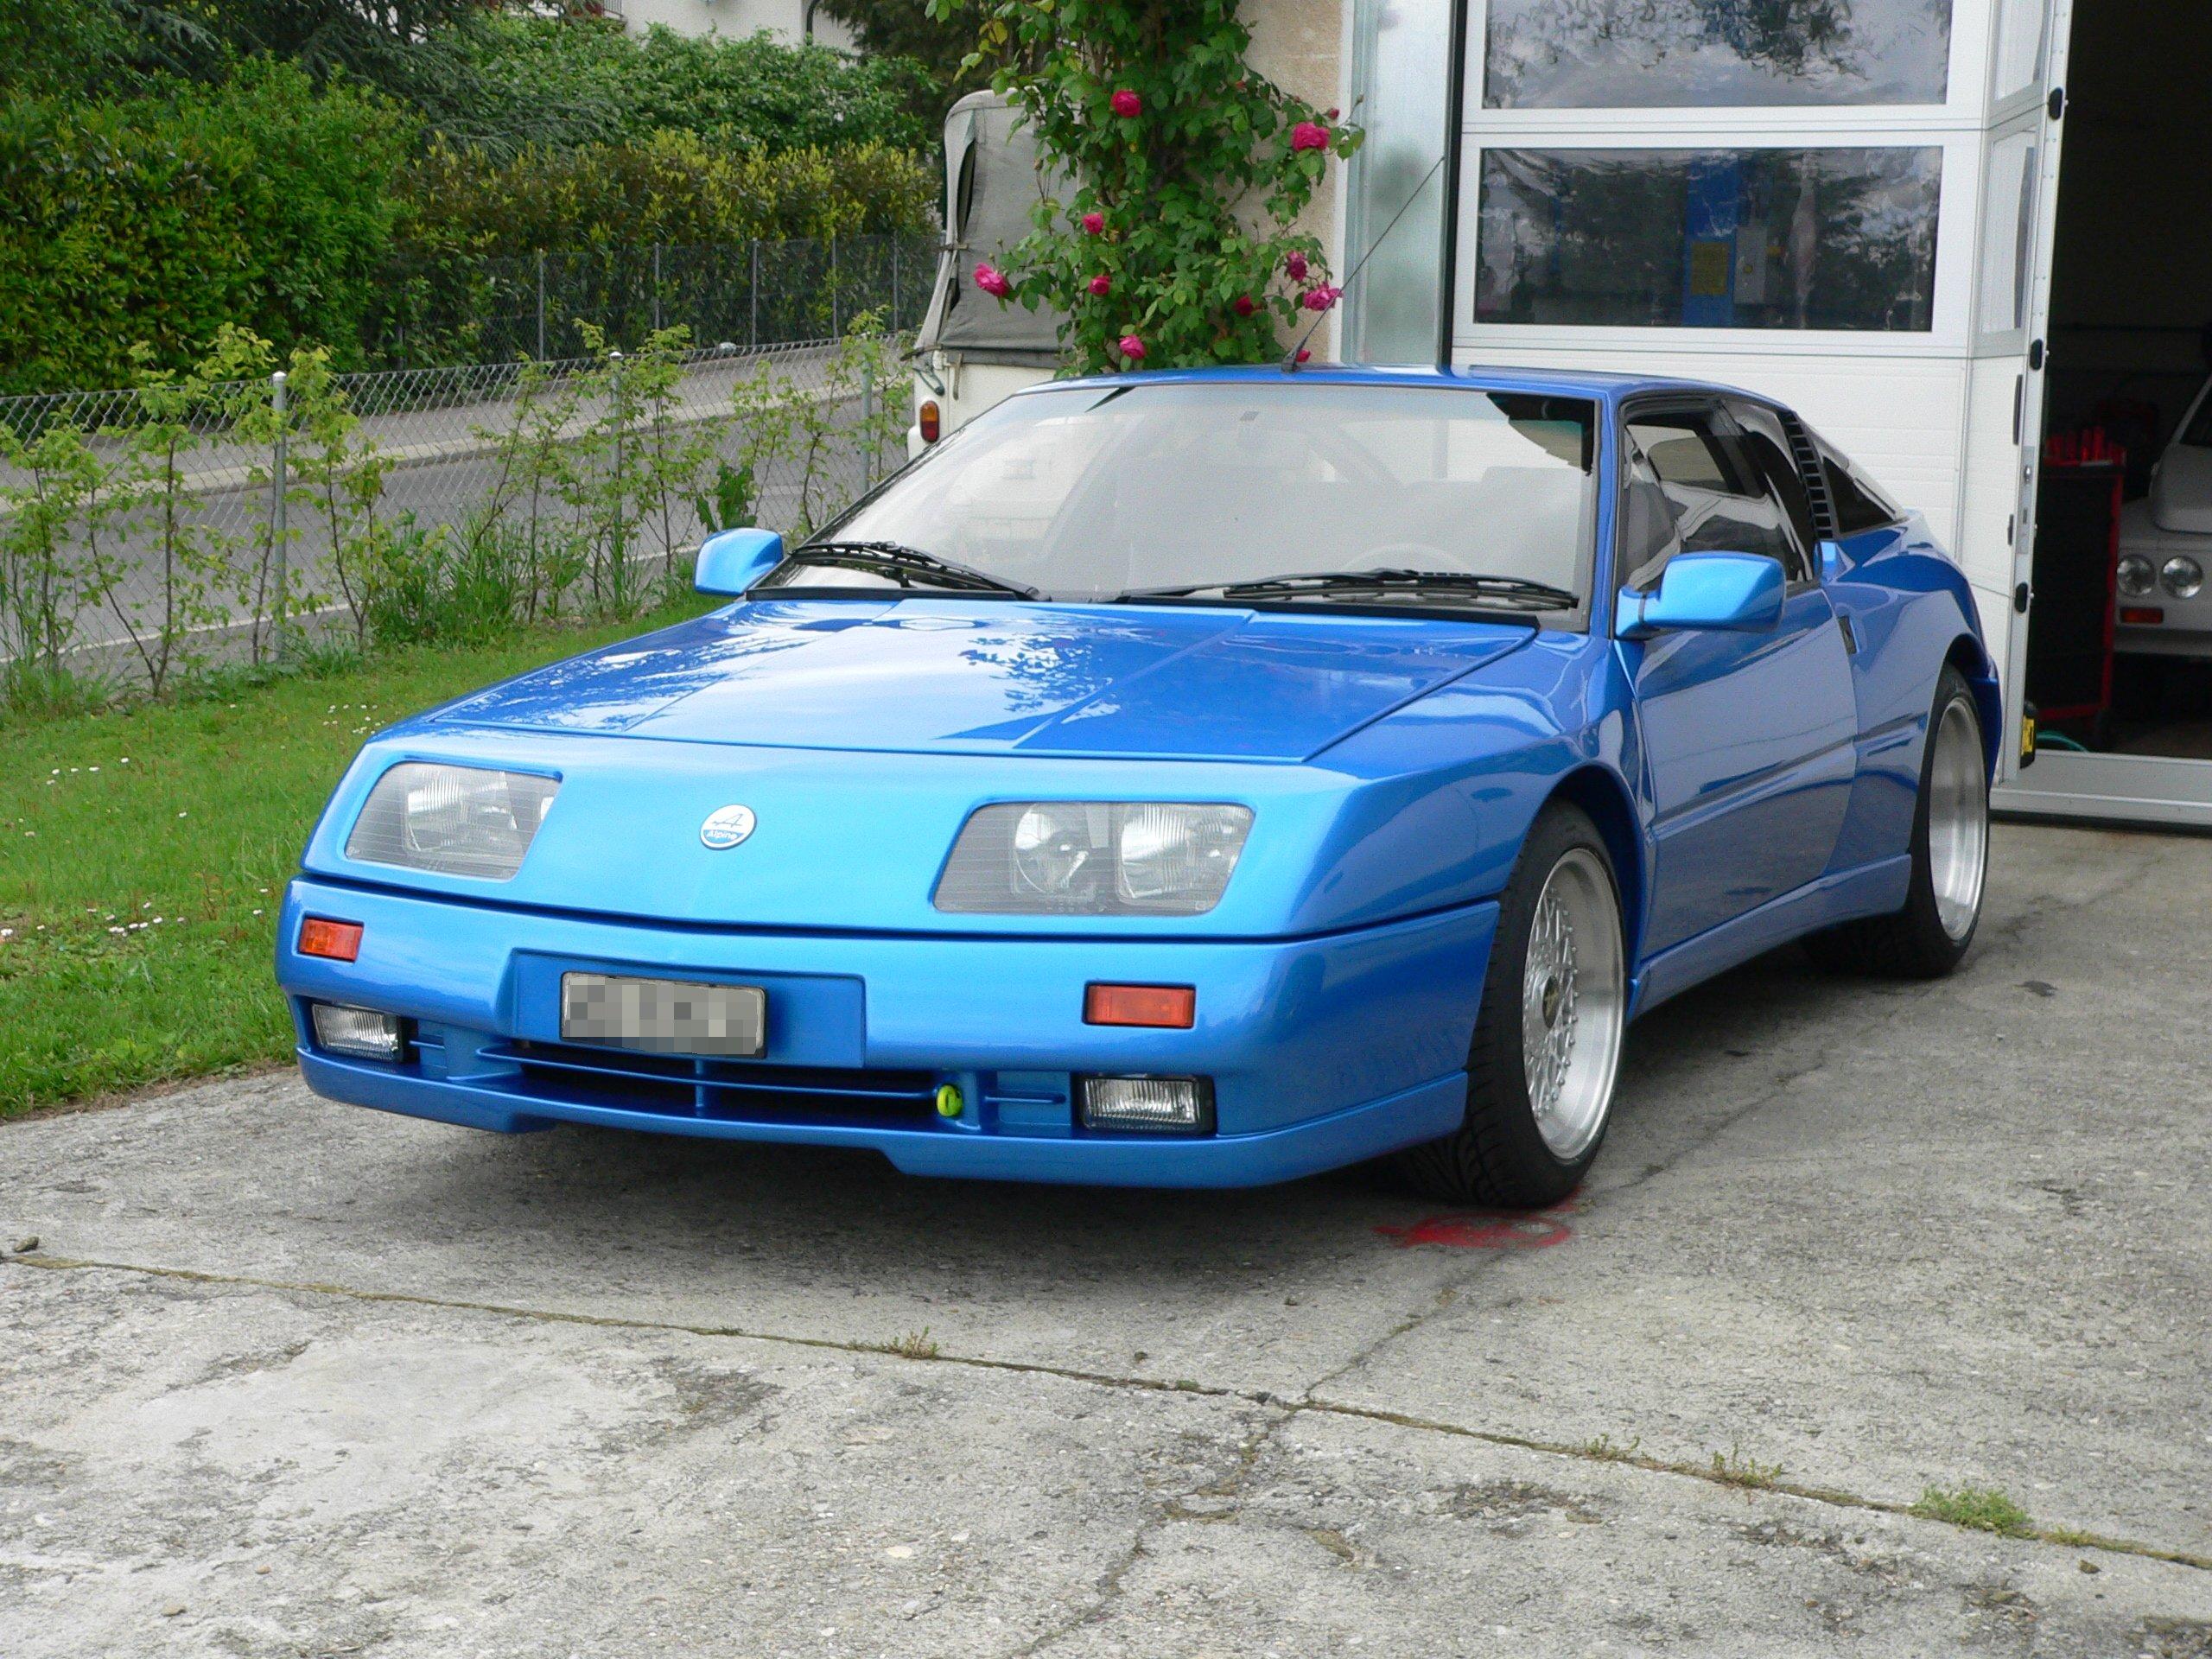 Alpine-p1040136 Amazing Bugatti Veyron Grand Sport Vitesse L'or Rouge Cars Trend